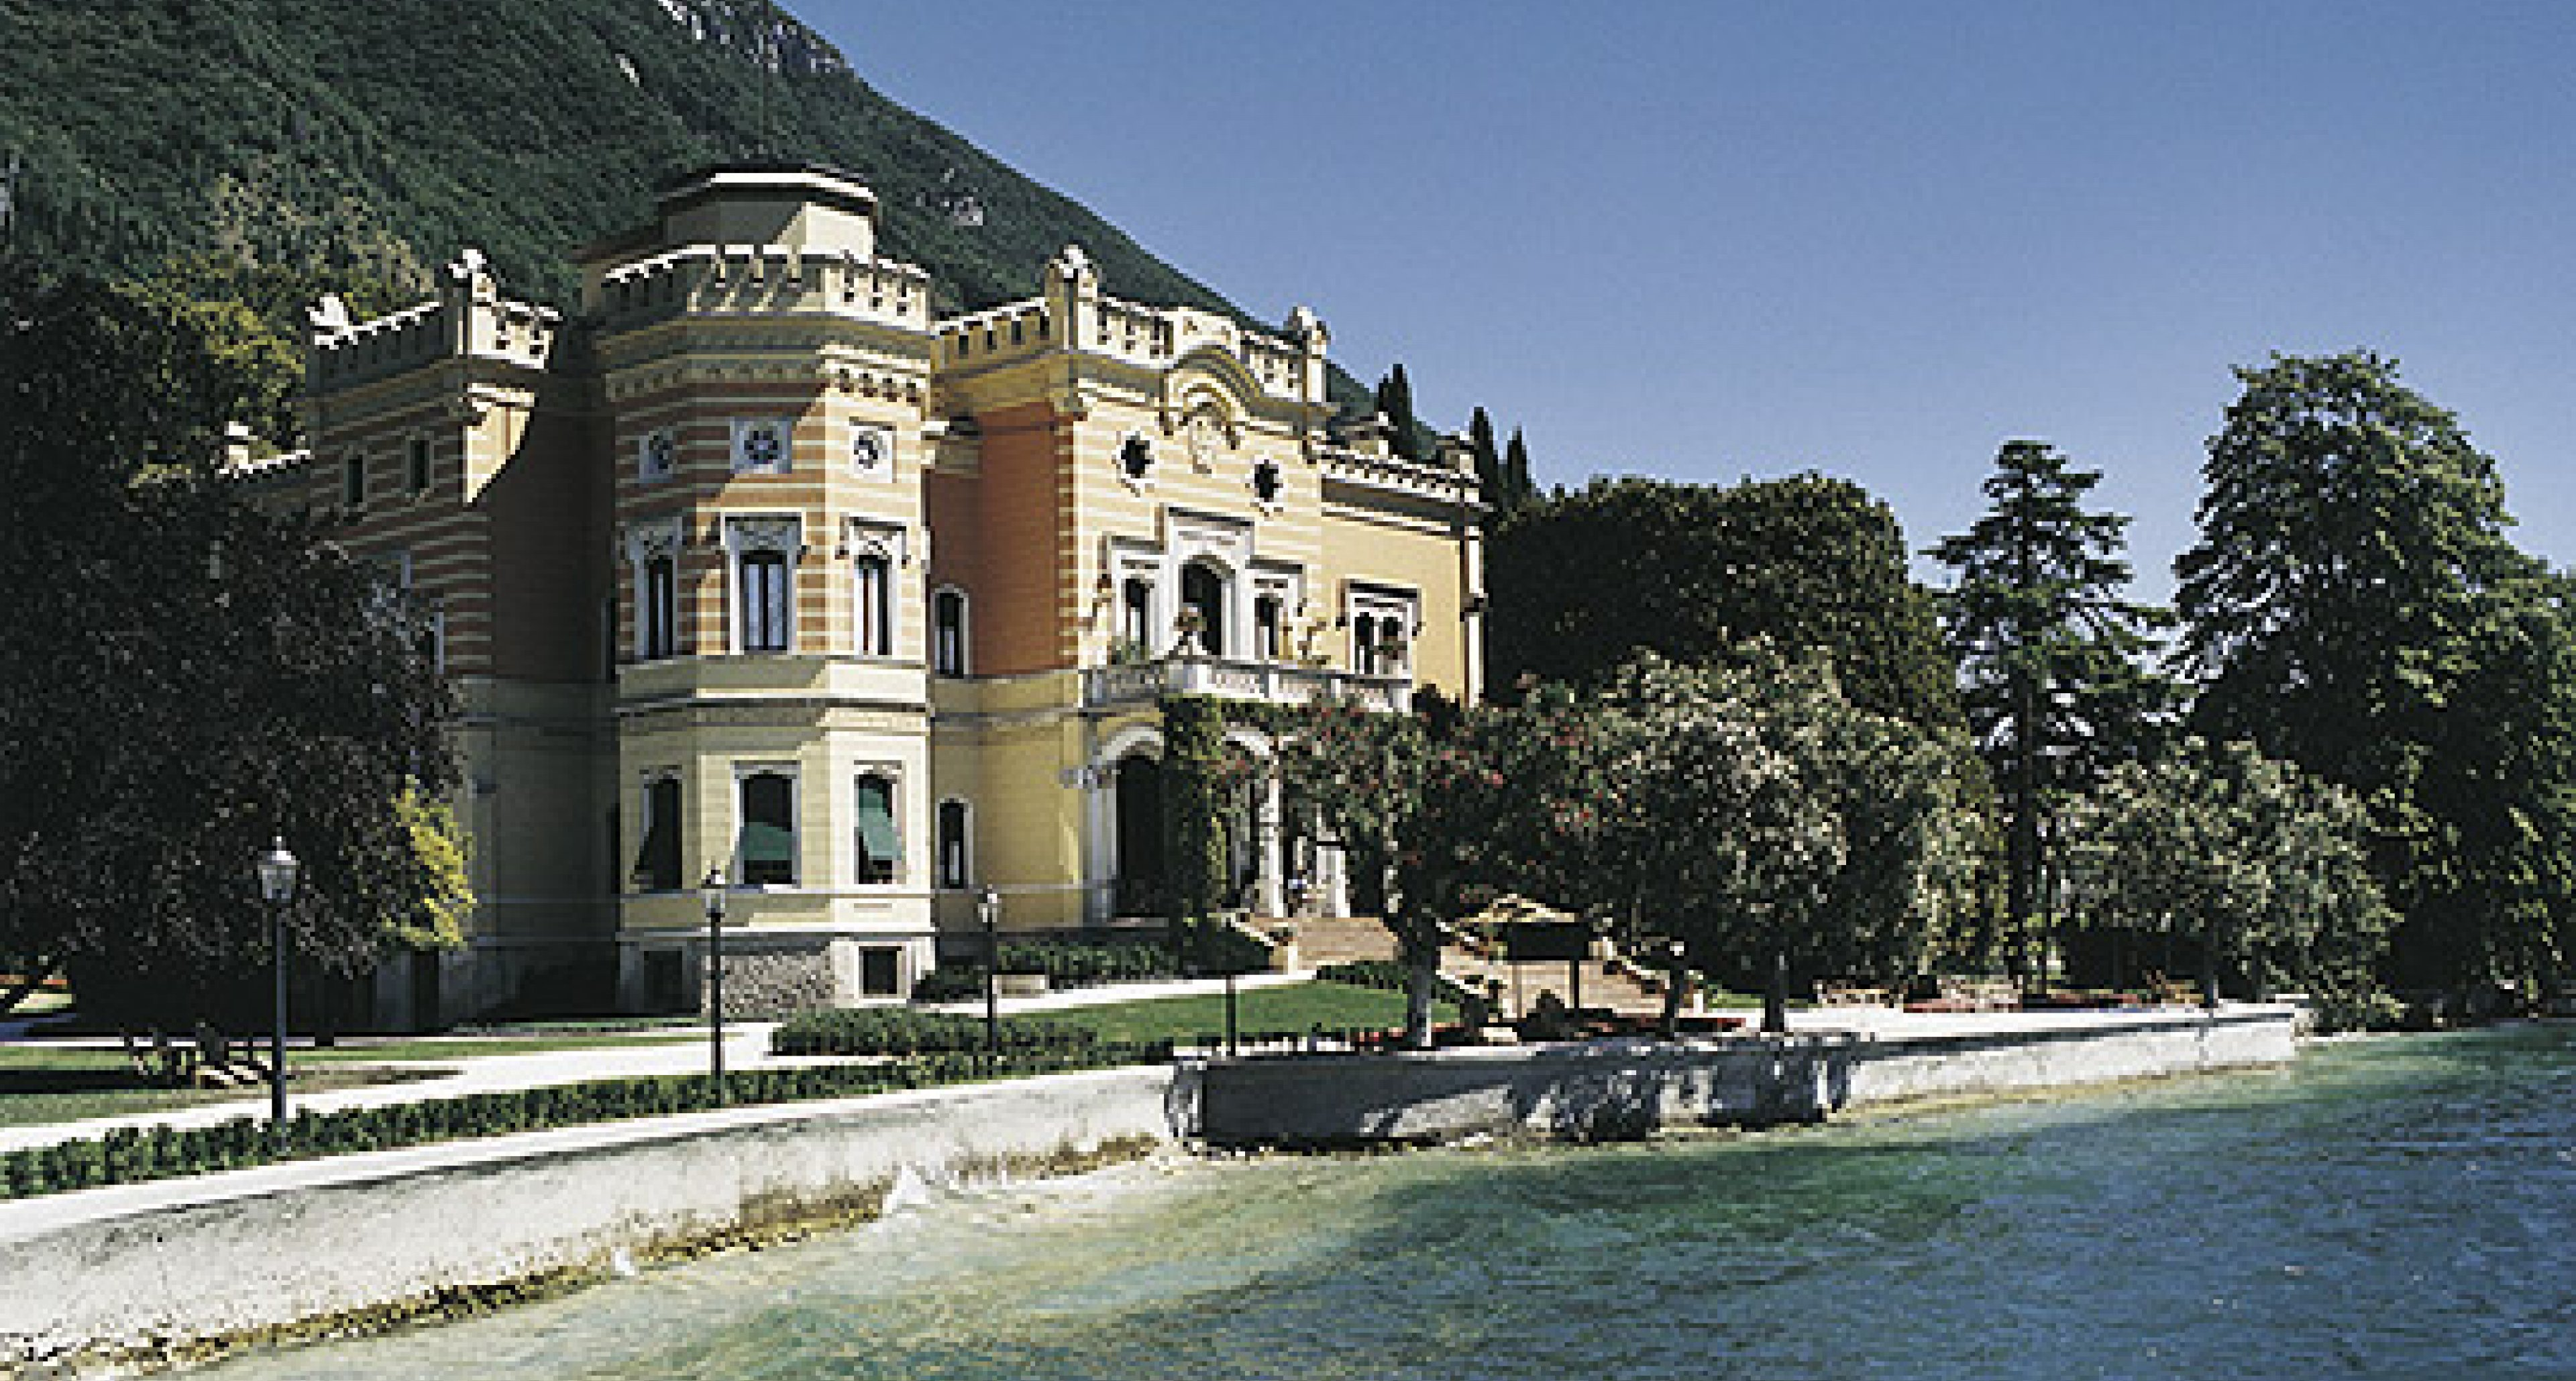 Hotel Villa Feltrinelli: Einladung zum Müßiggang